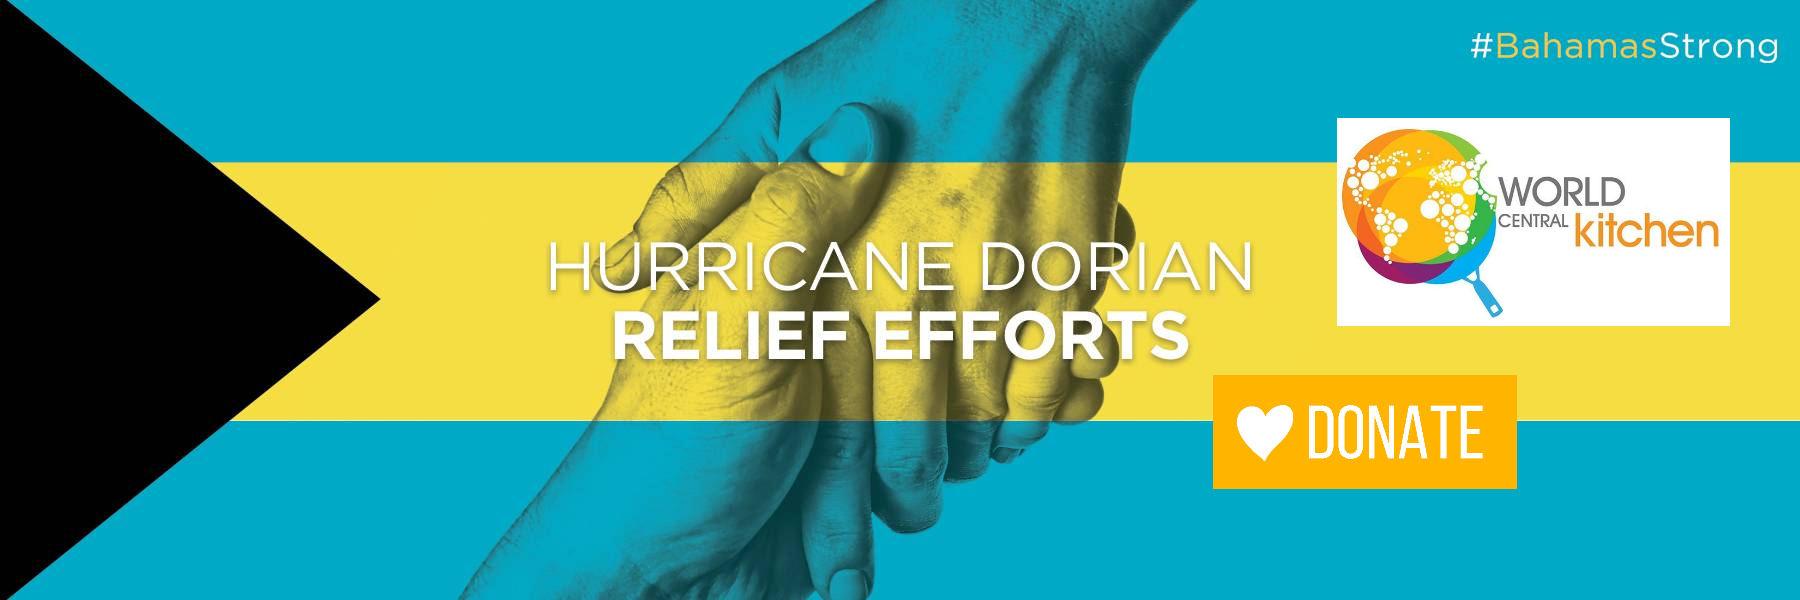 hurricane-relief-lp-header A.jpg